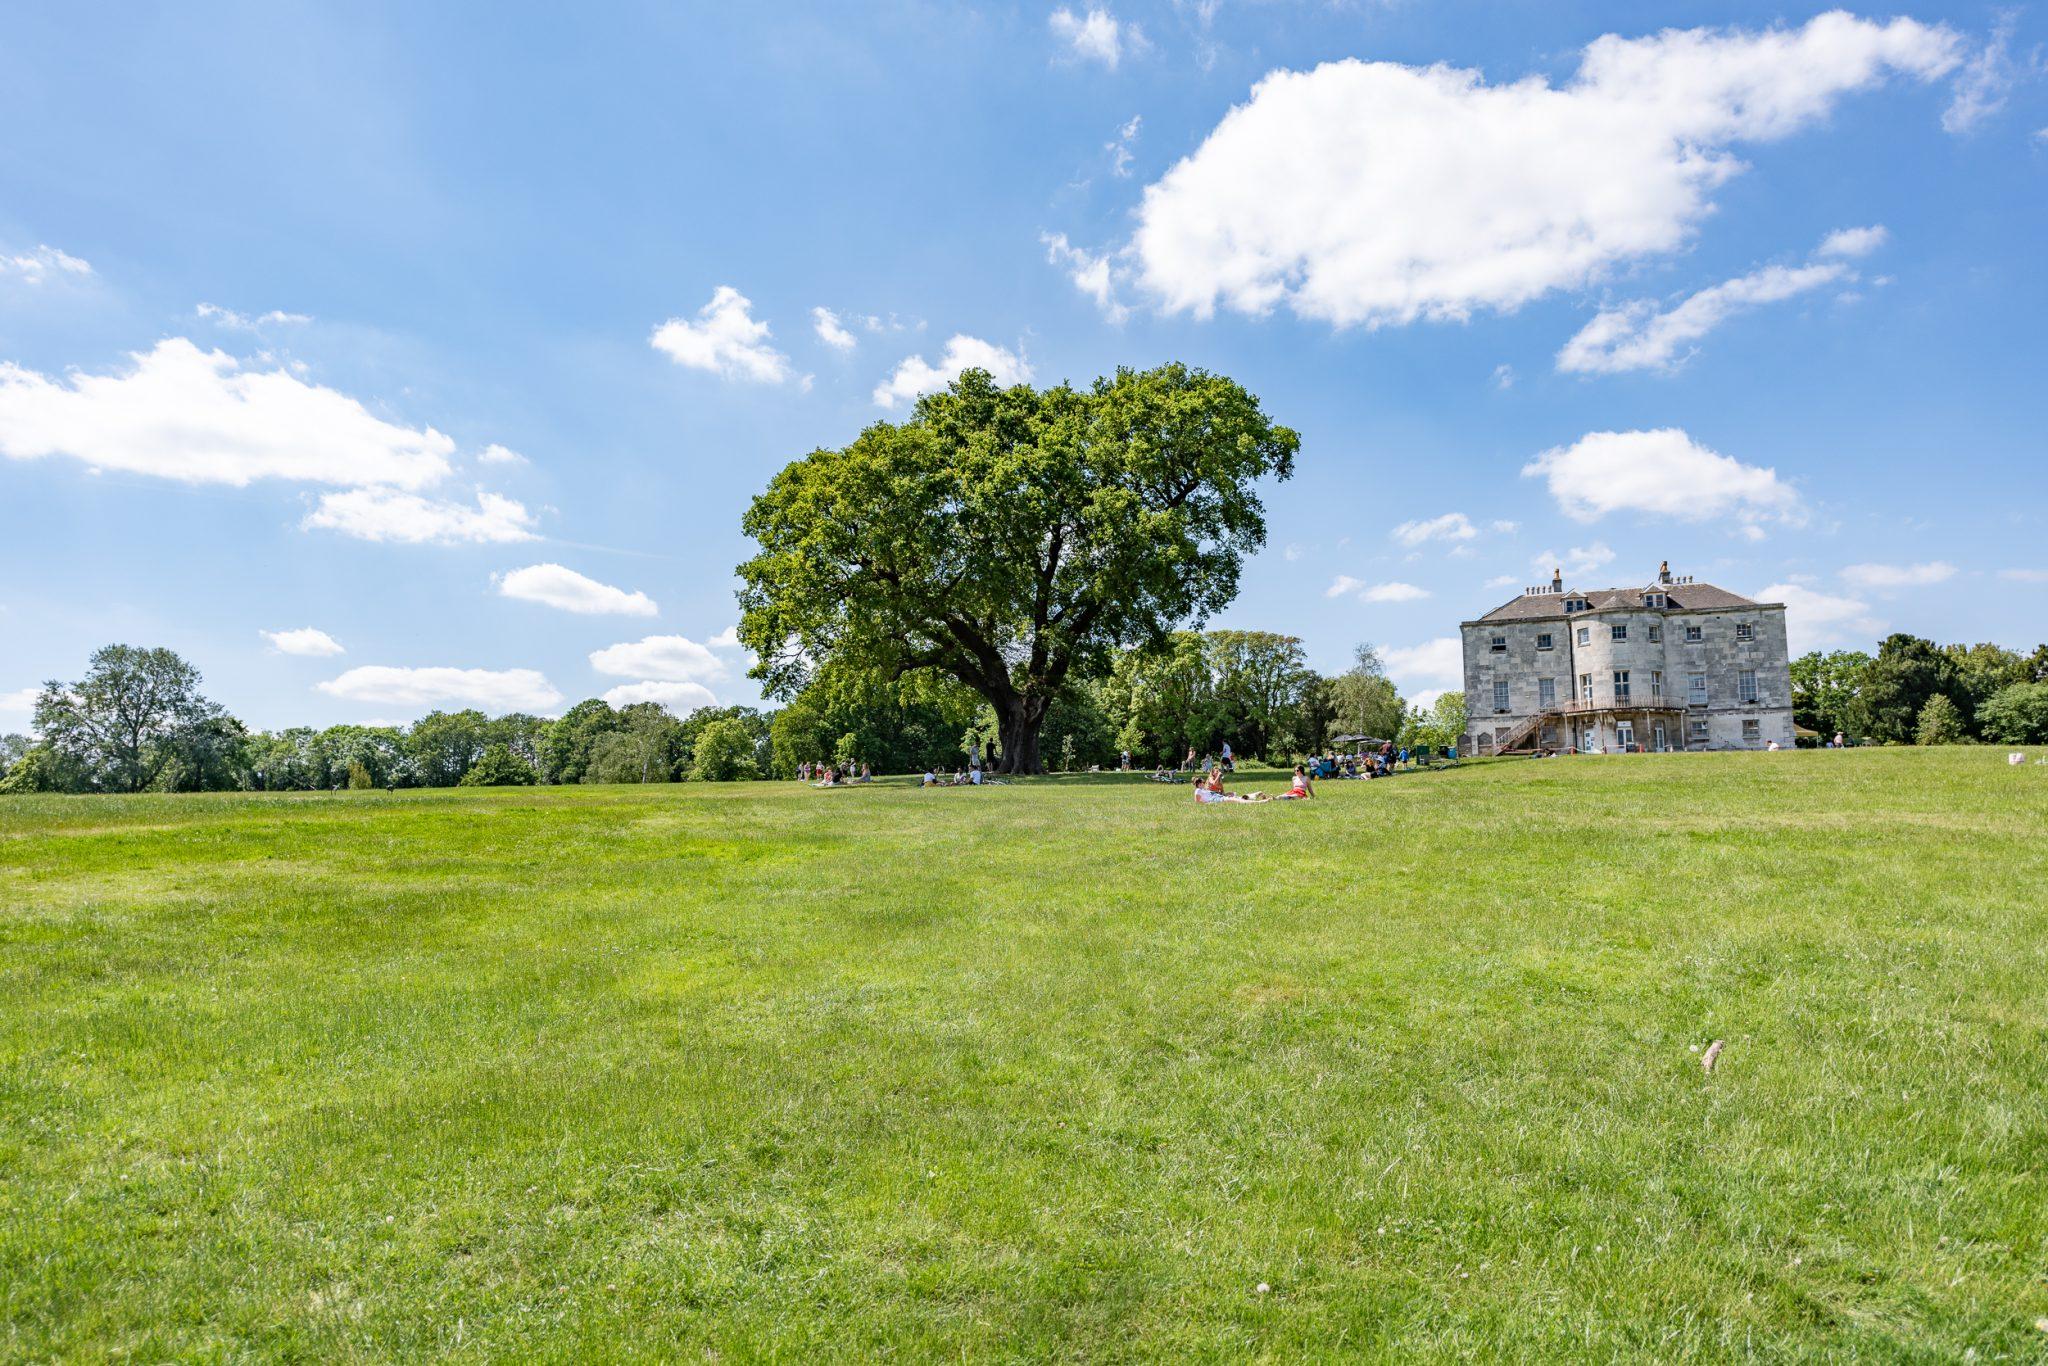 Beckenham Palace